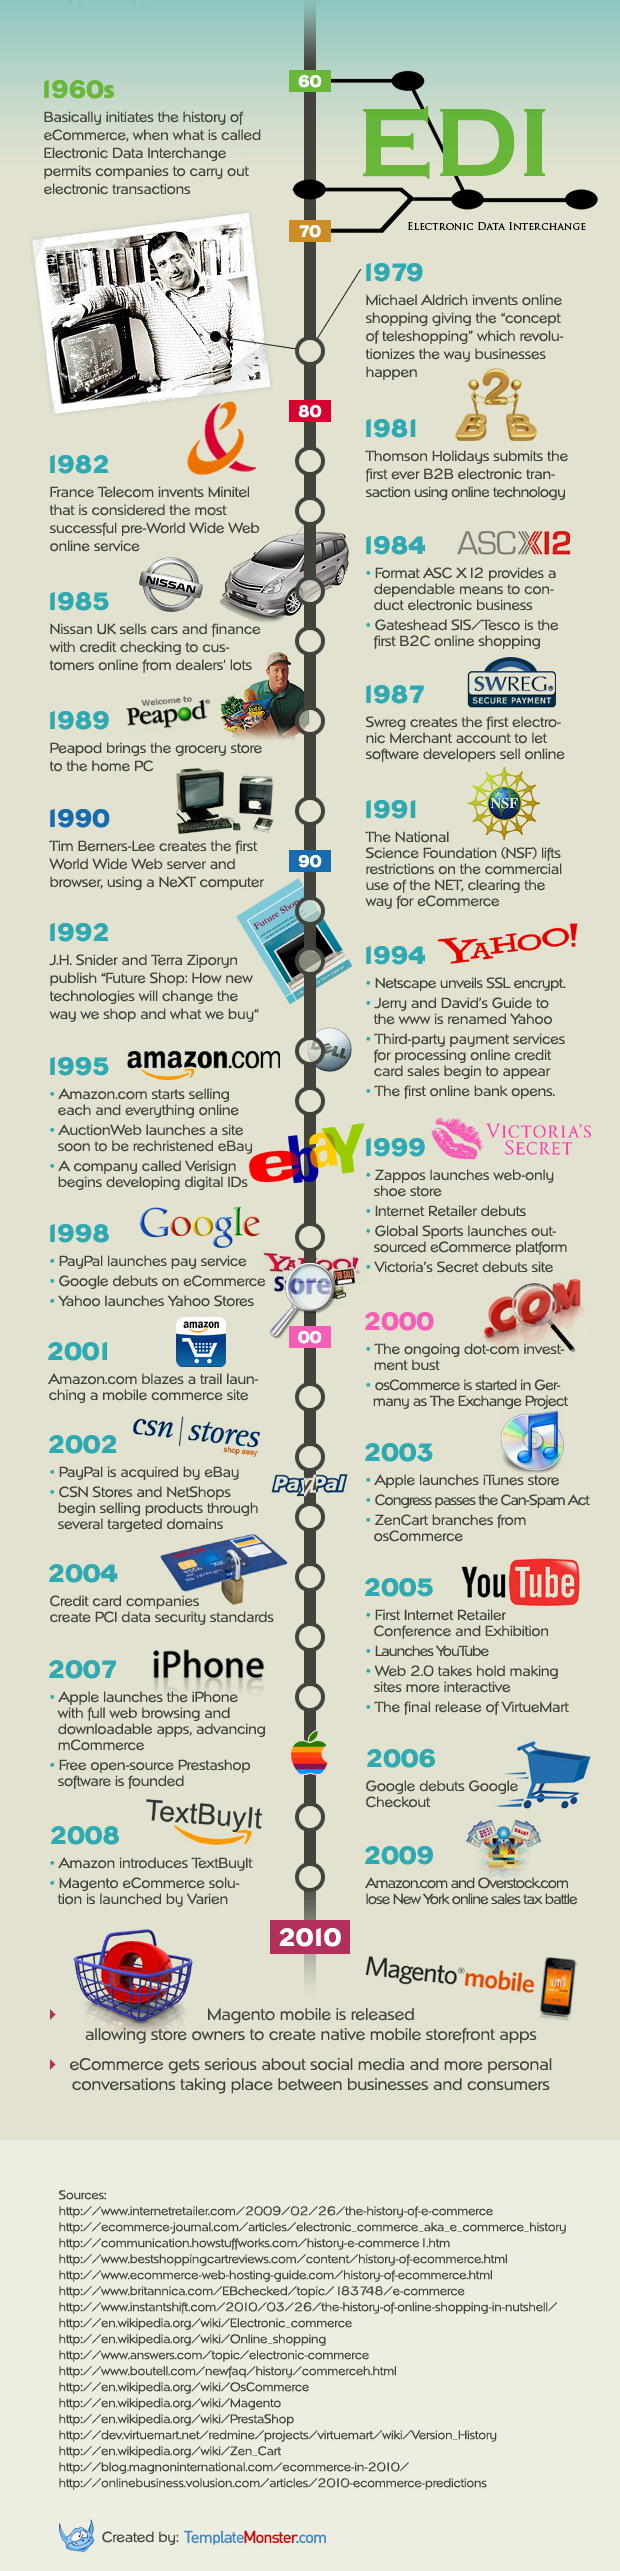 History of Online Dating Brainz